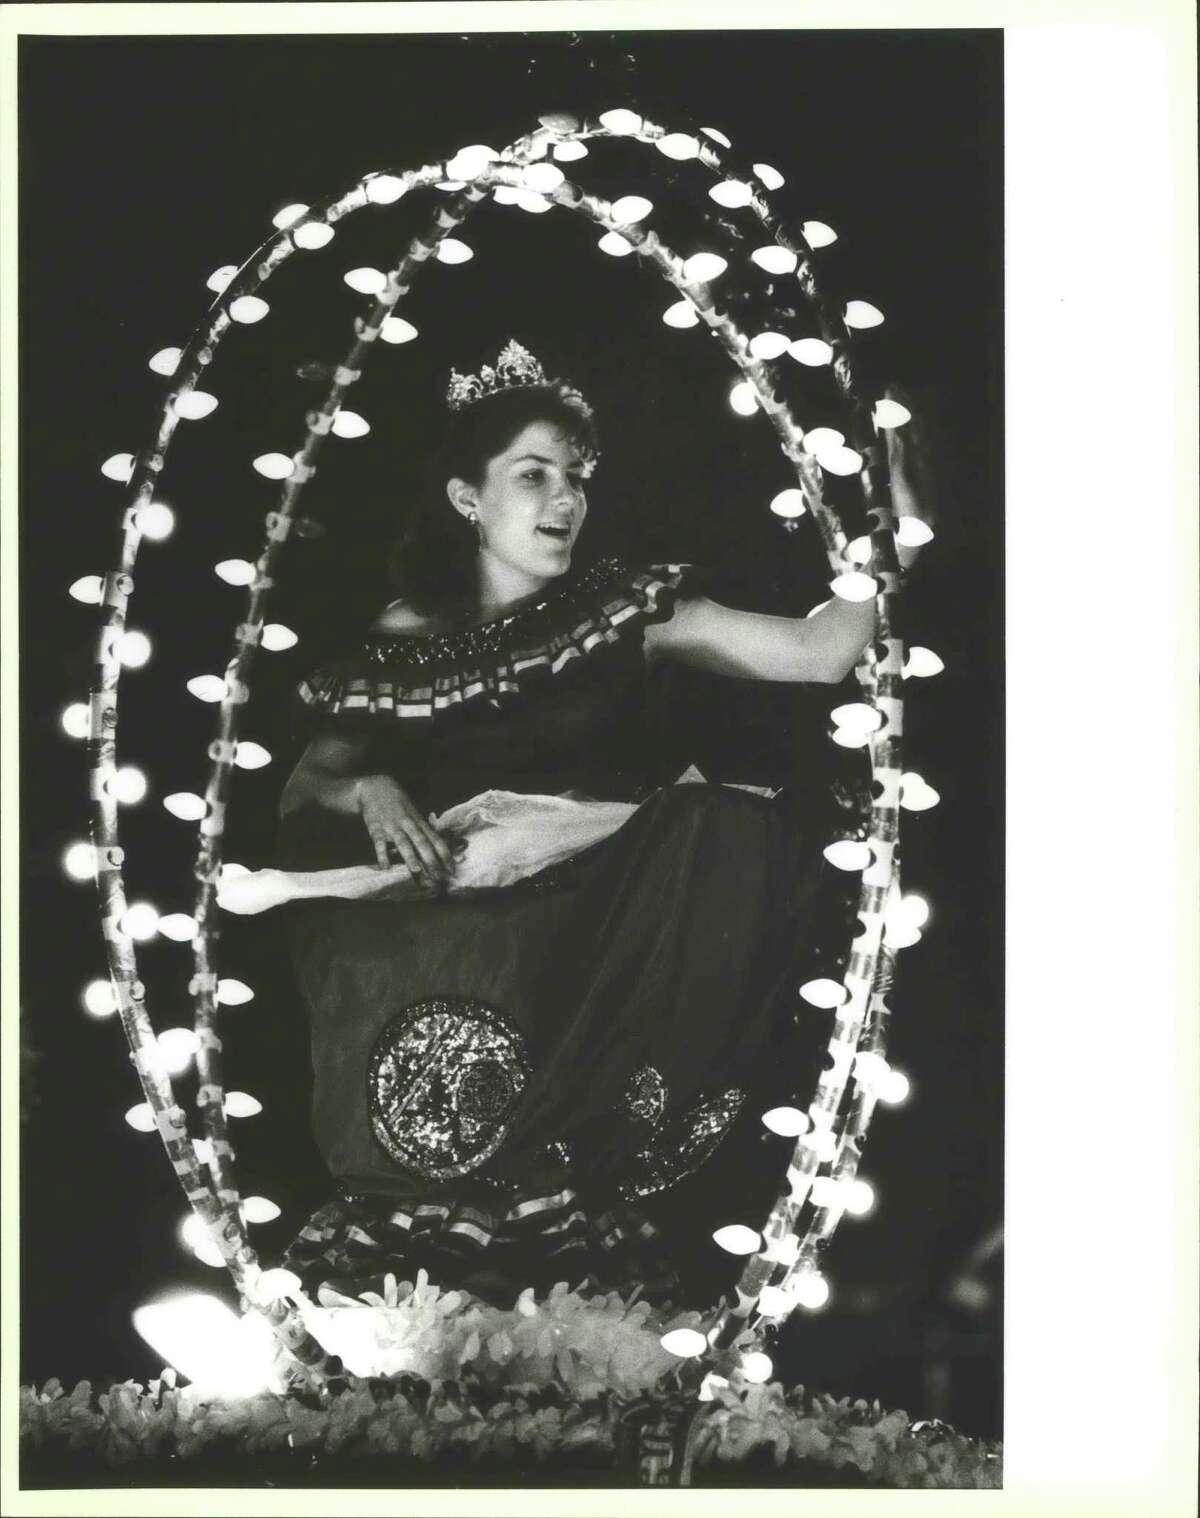 San Antonio Flambeau Rey Feo Parade, Cece Rodriguez on float, on Broadway